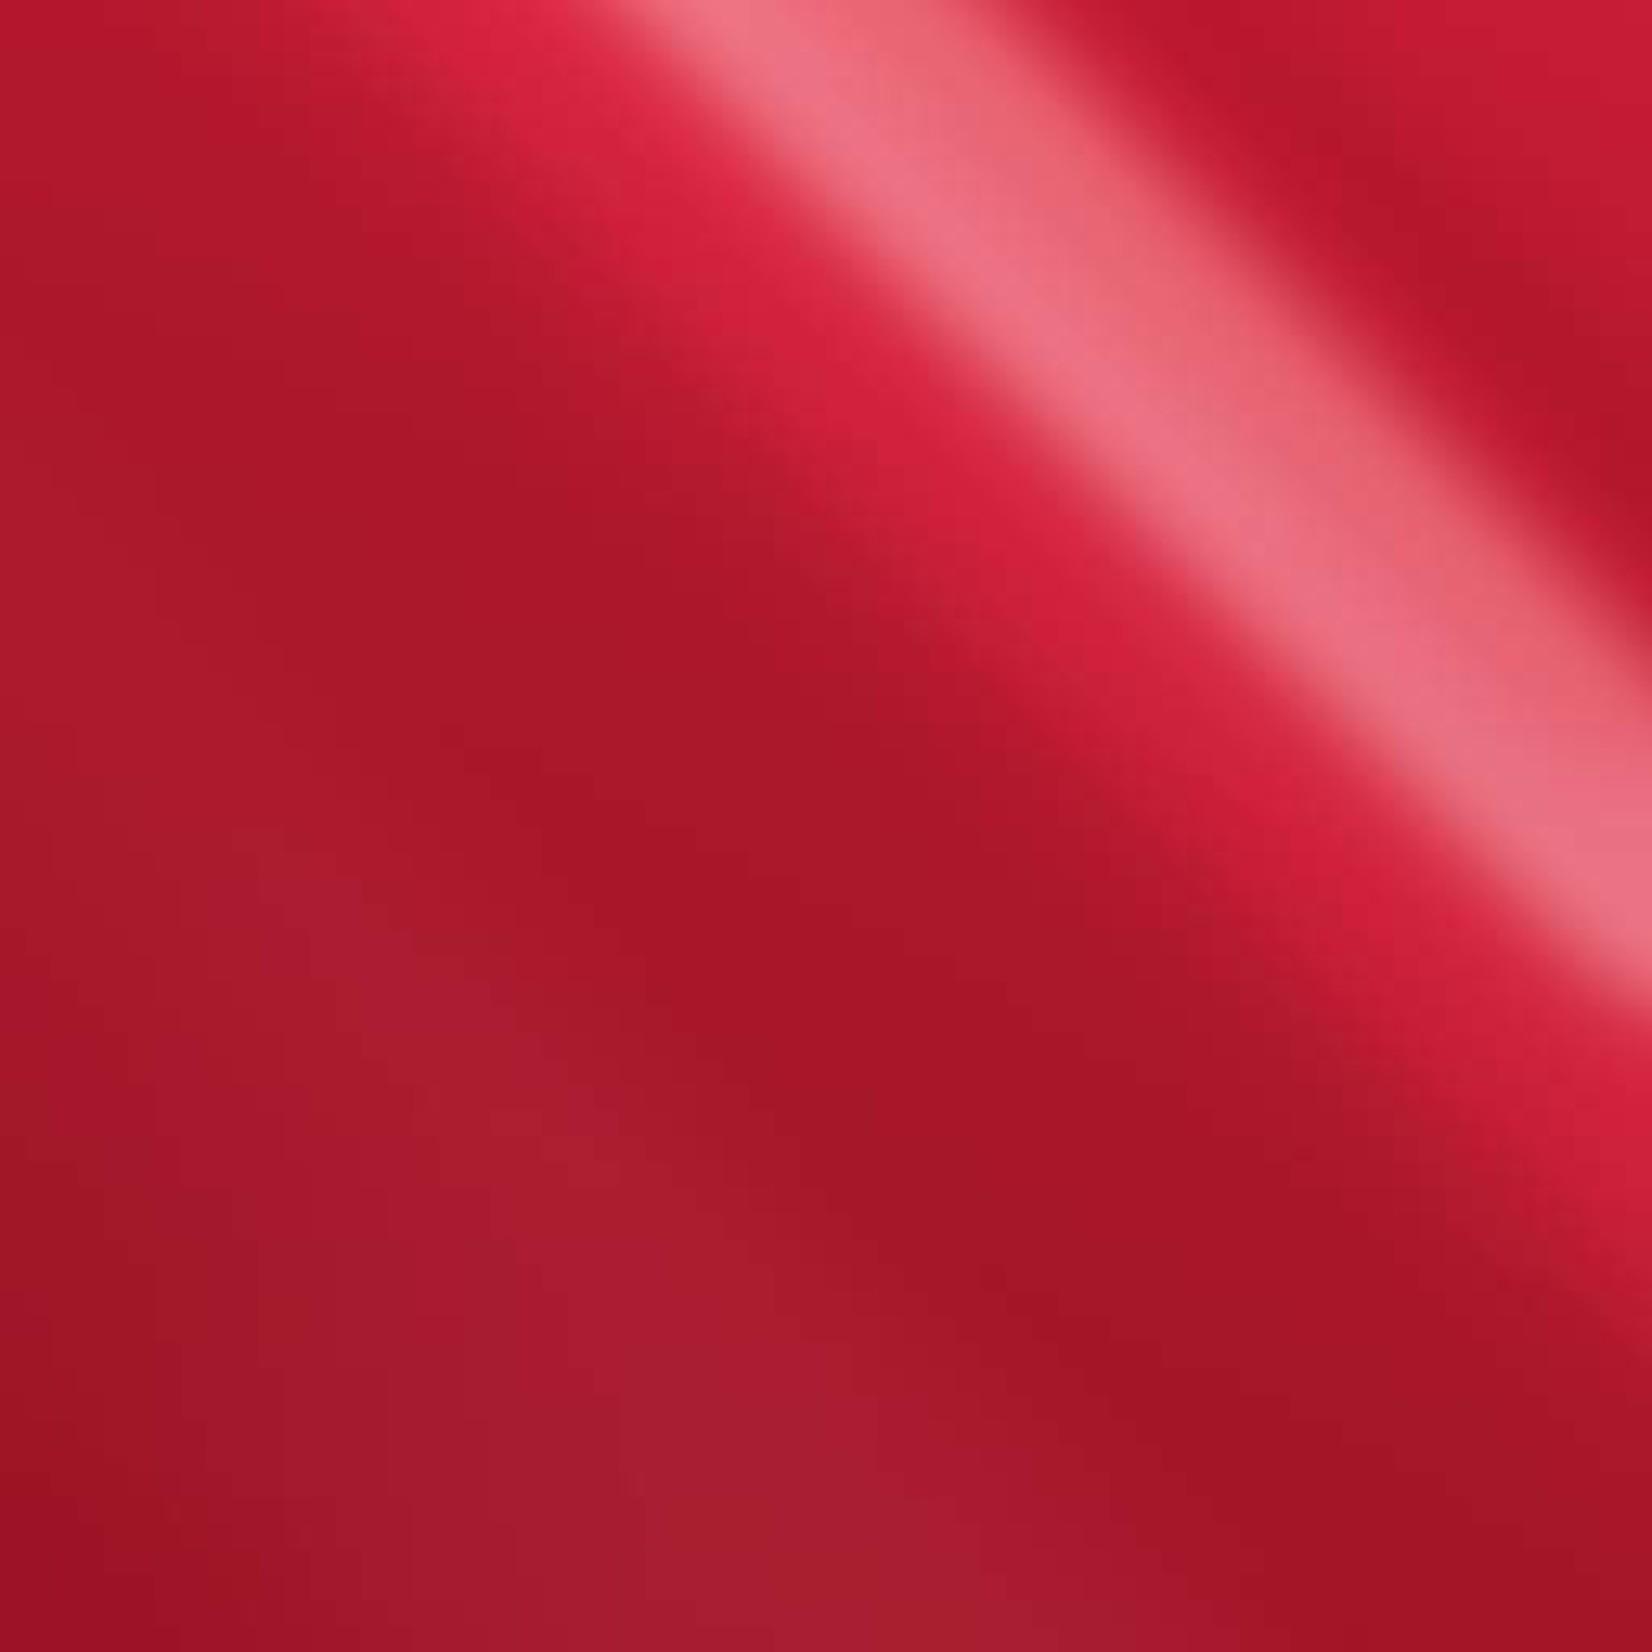 HTV Pack Valentine Red Plaid